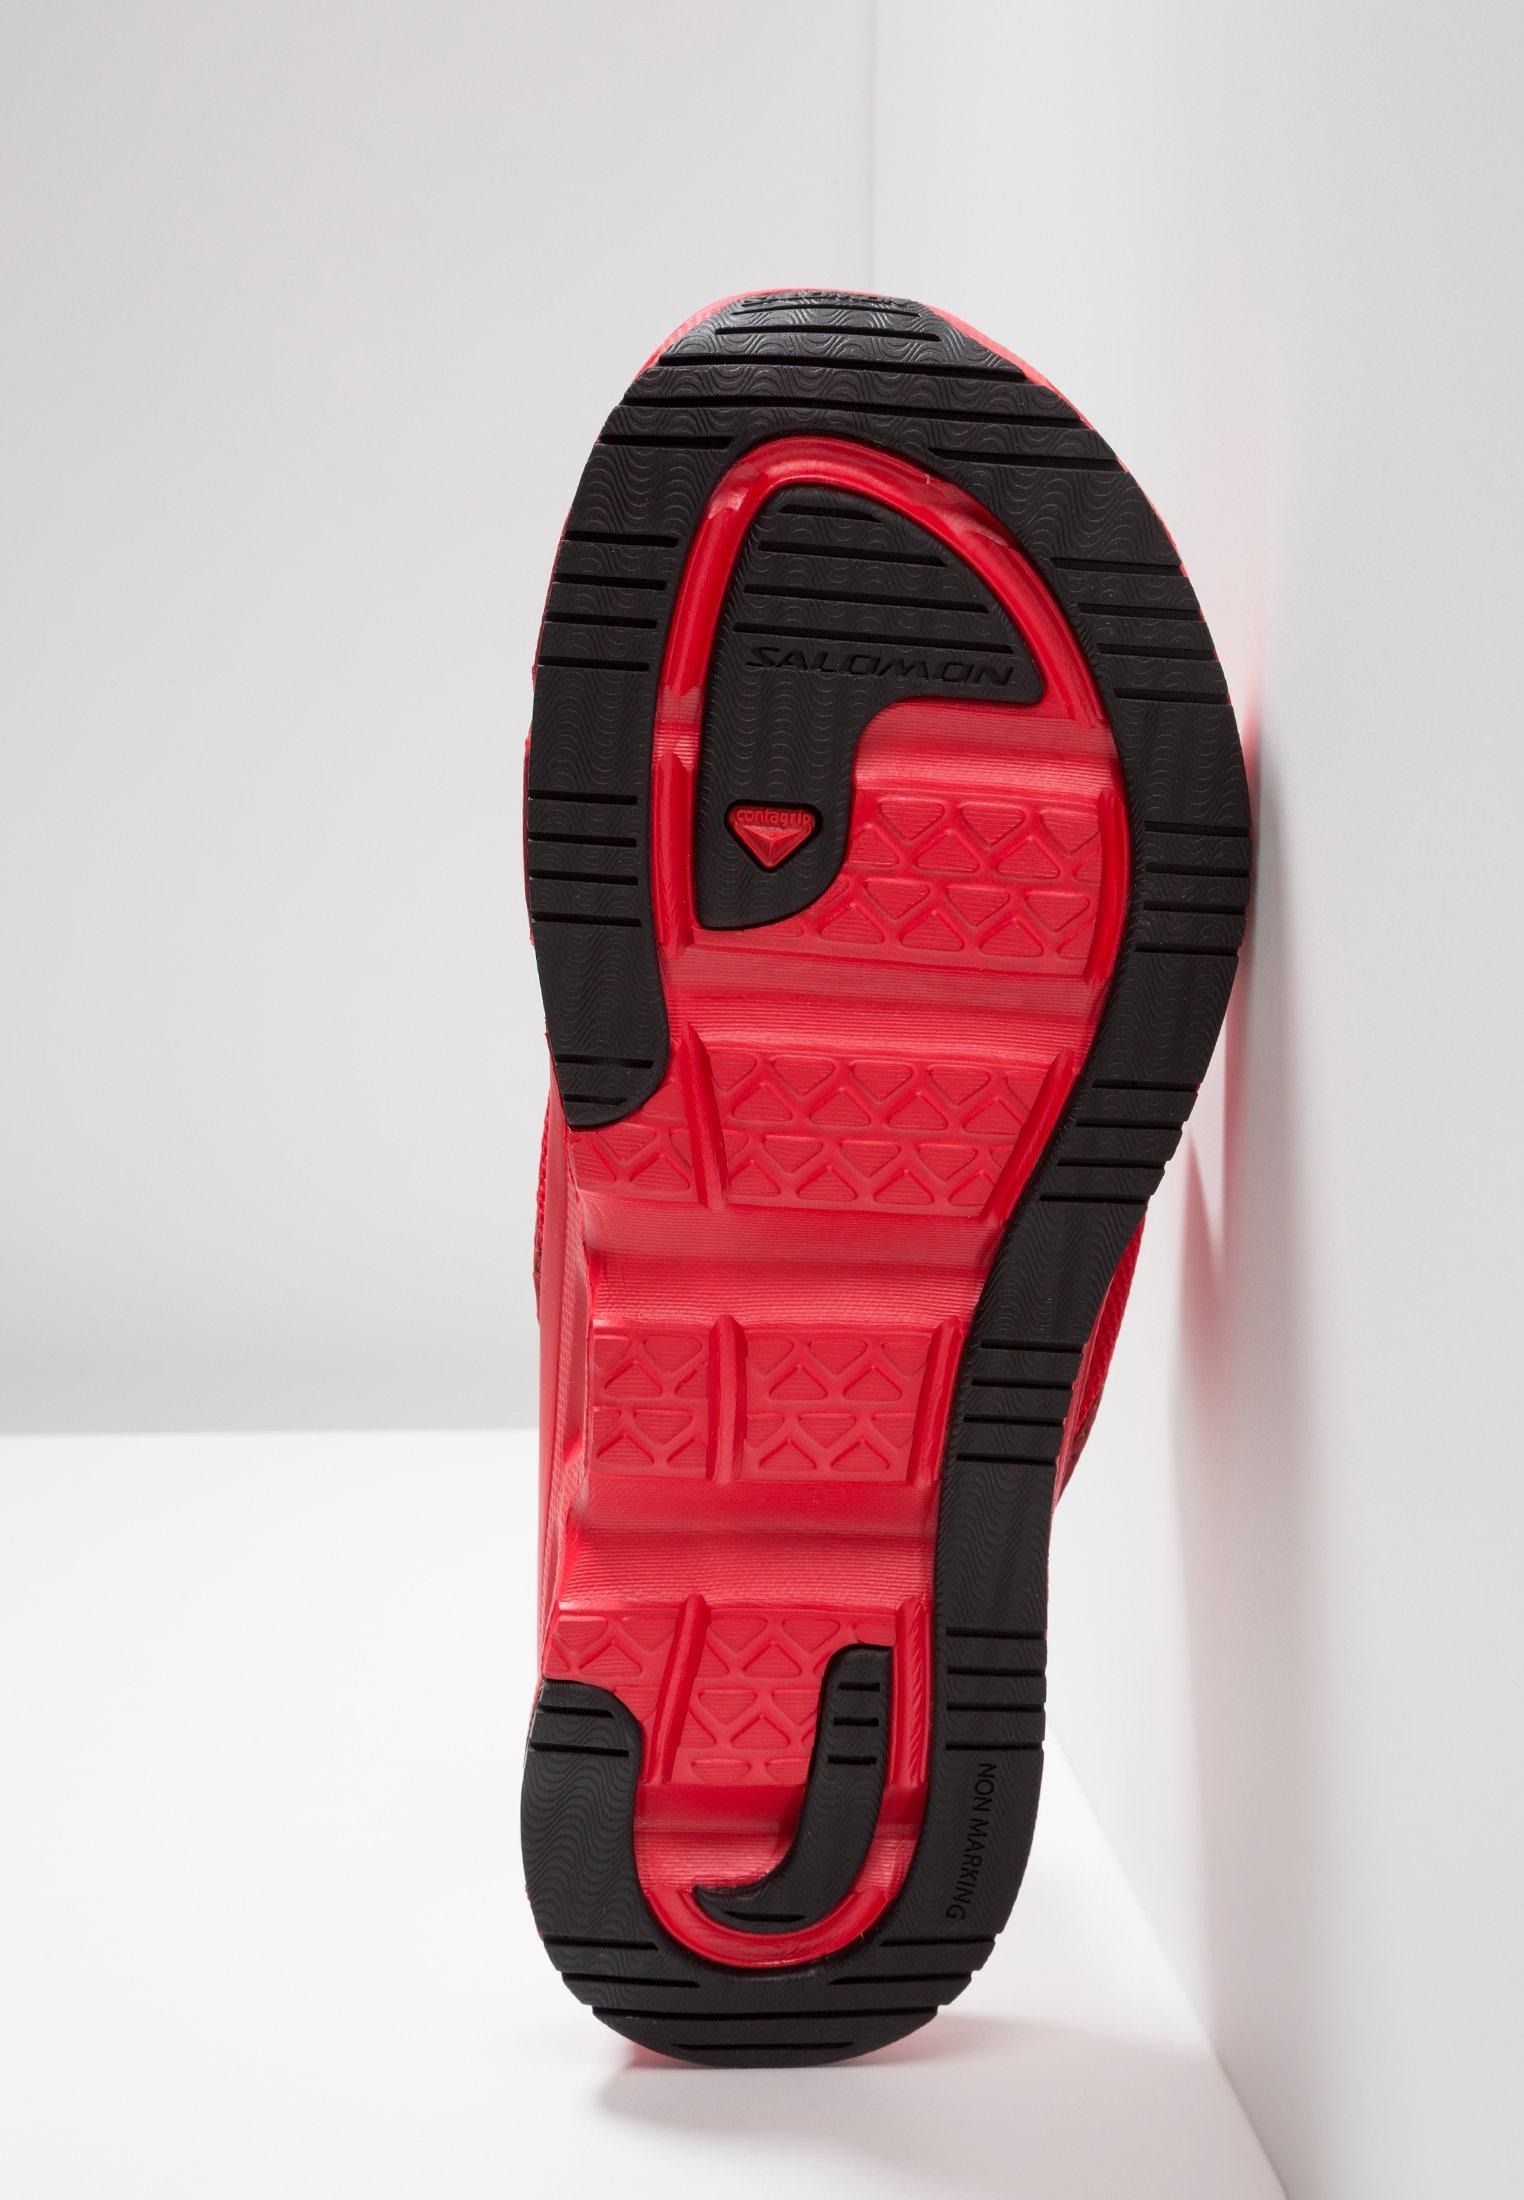 Rx Salomon black RegenrationTongs Red 0 4 Dahlia Moc red High Risk tCohxQdsrB